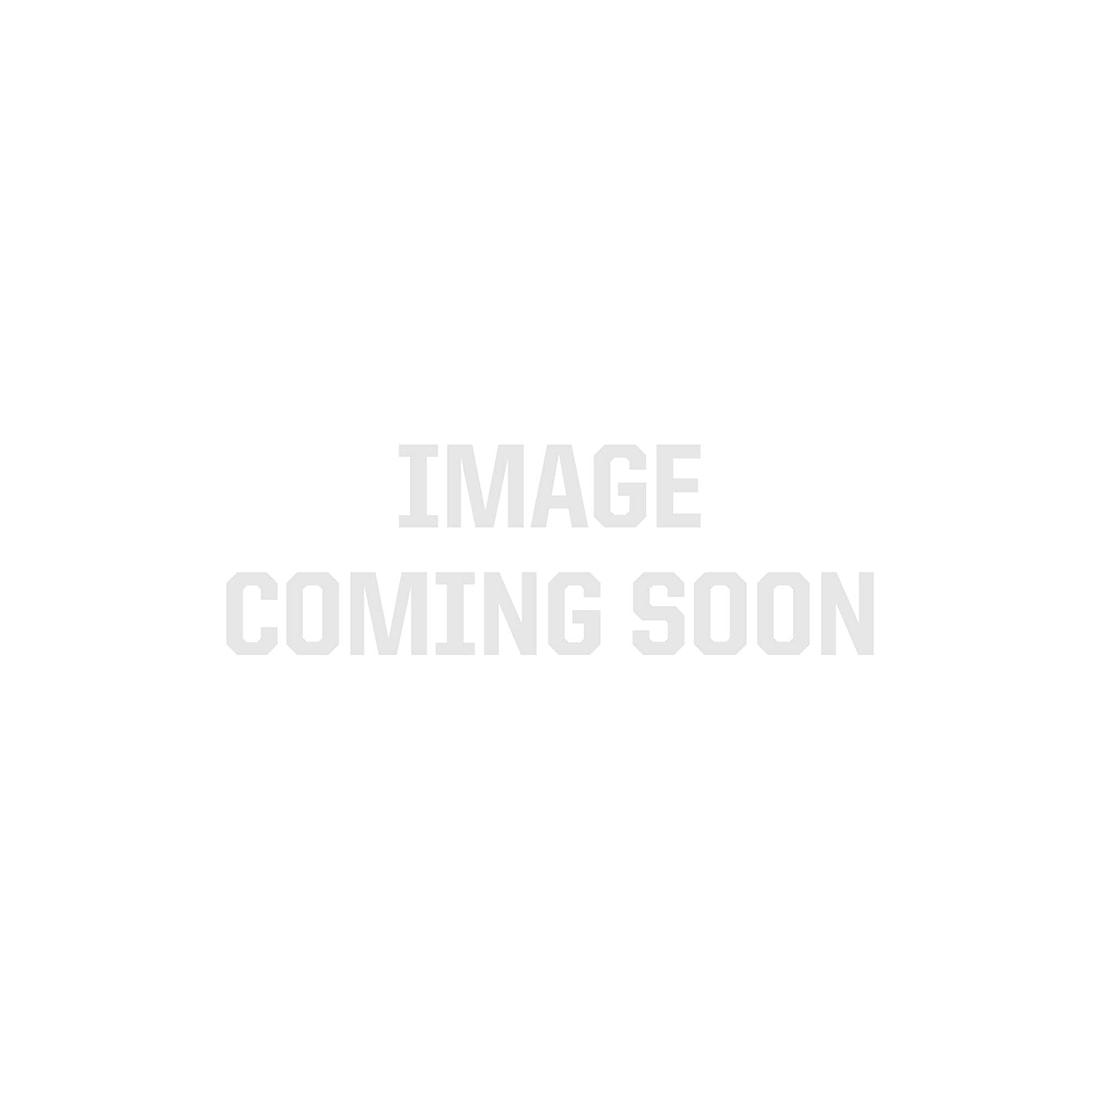 LumenMax 2835 LED Strip Light - 6,500K - 240/m - CurrentControl - Foot